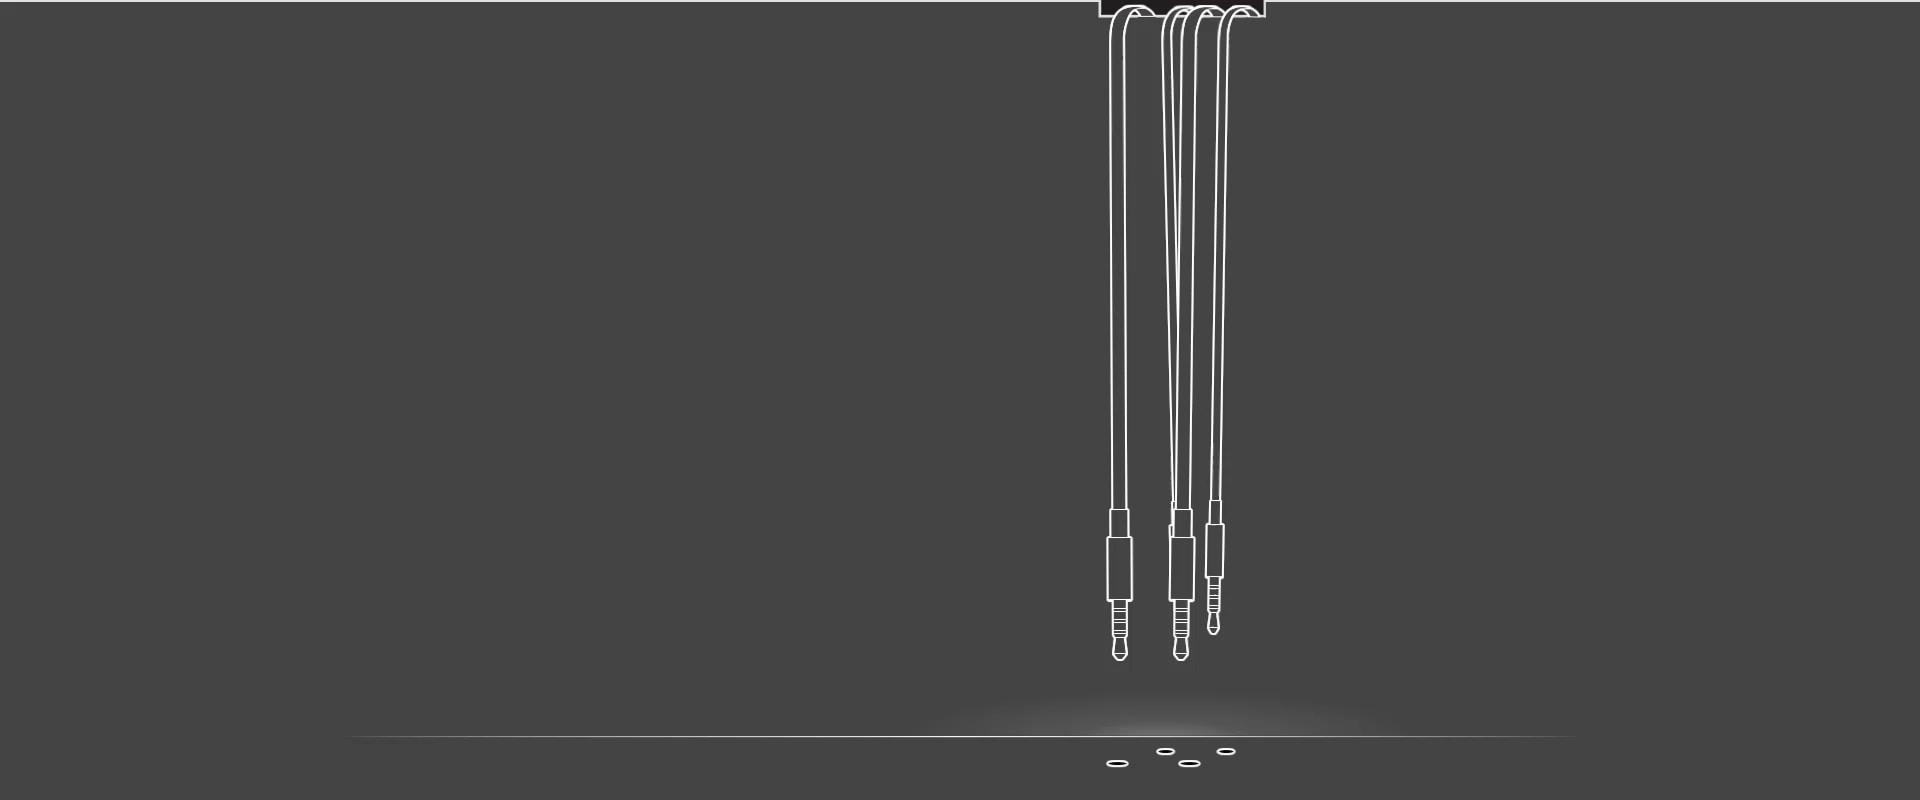 Animation of headphone jacks